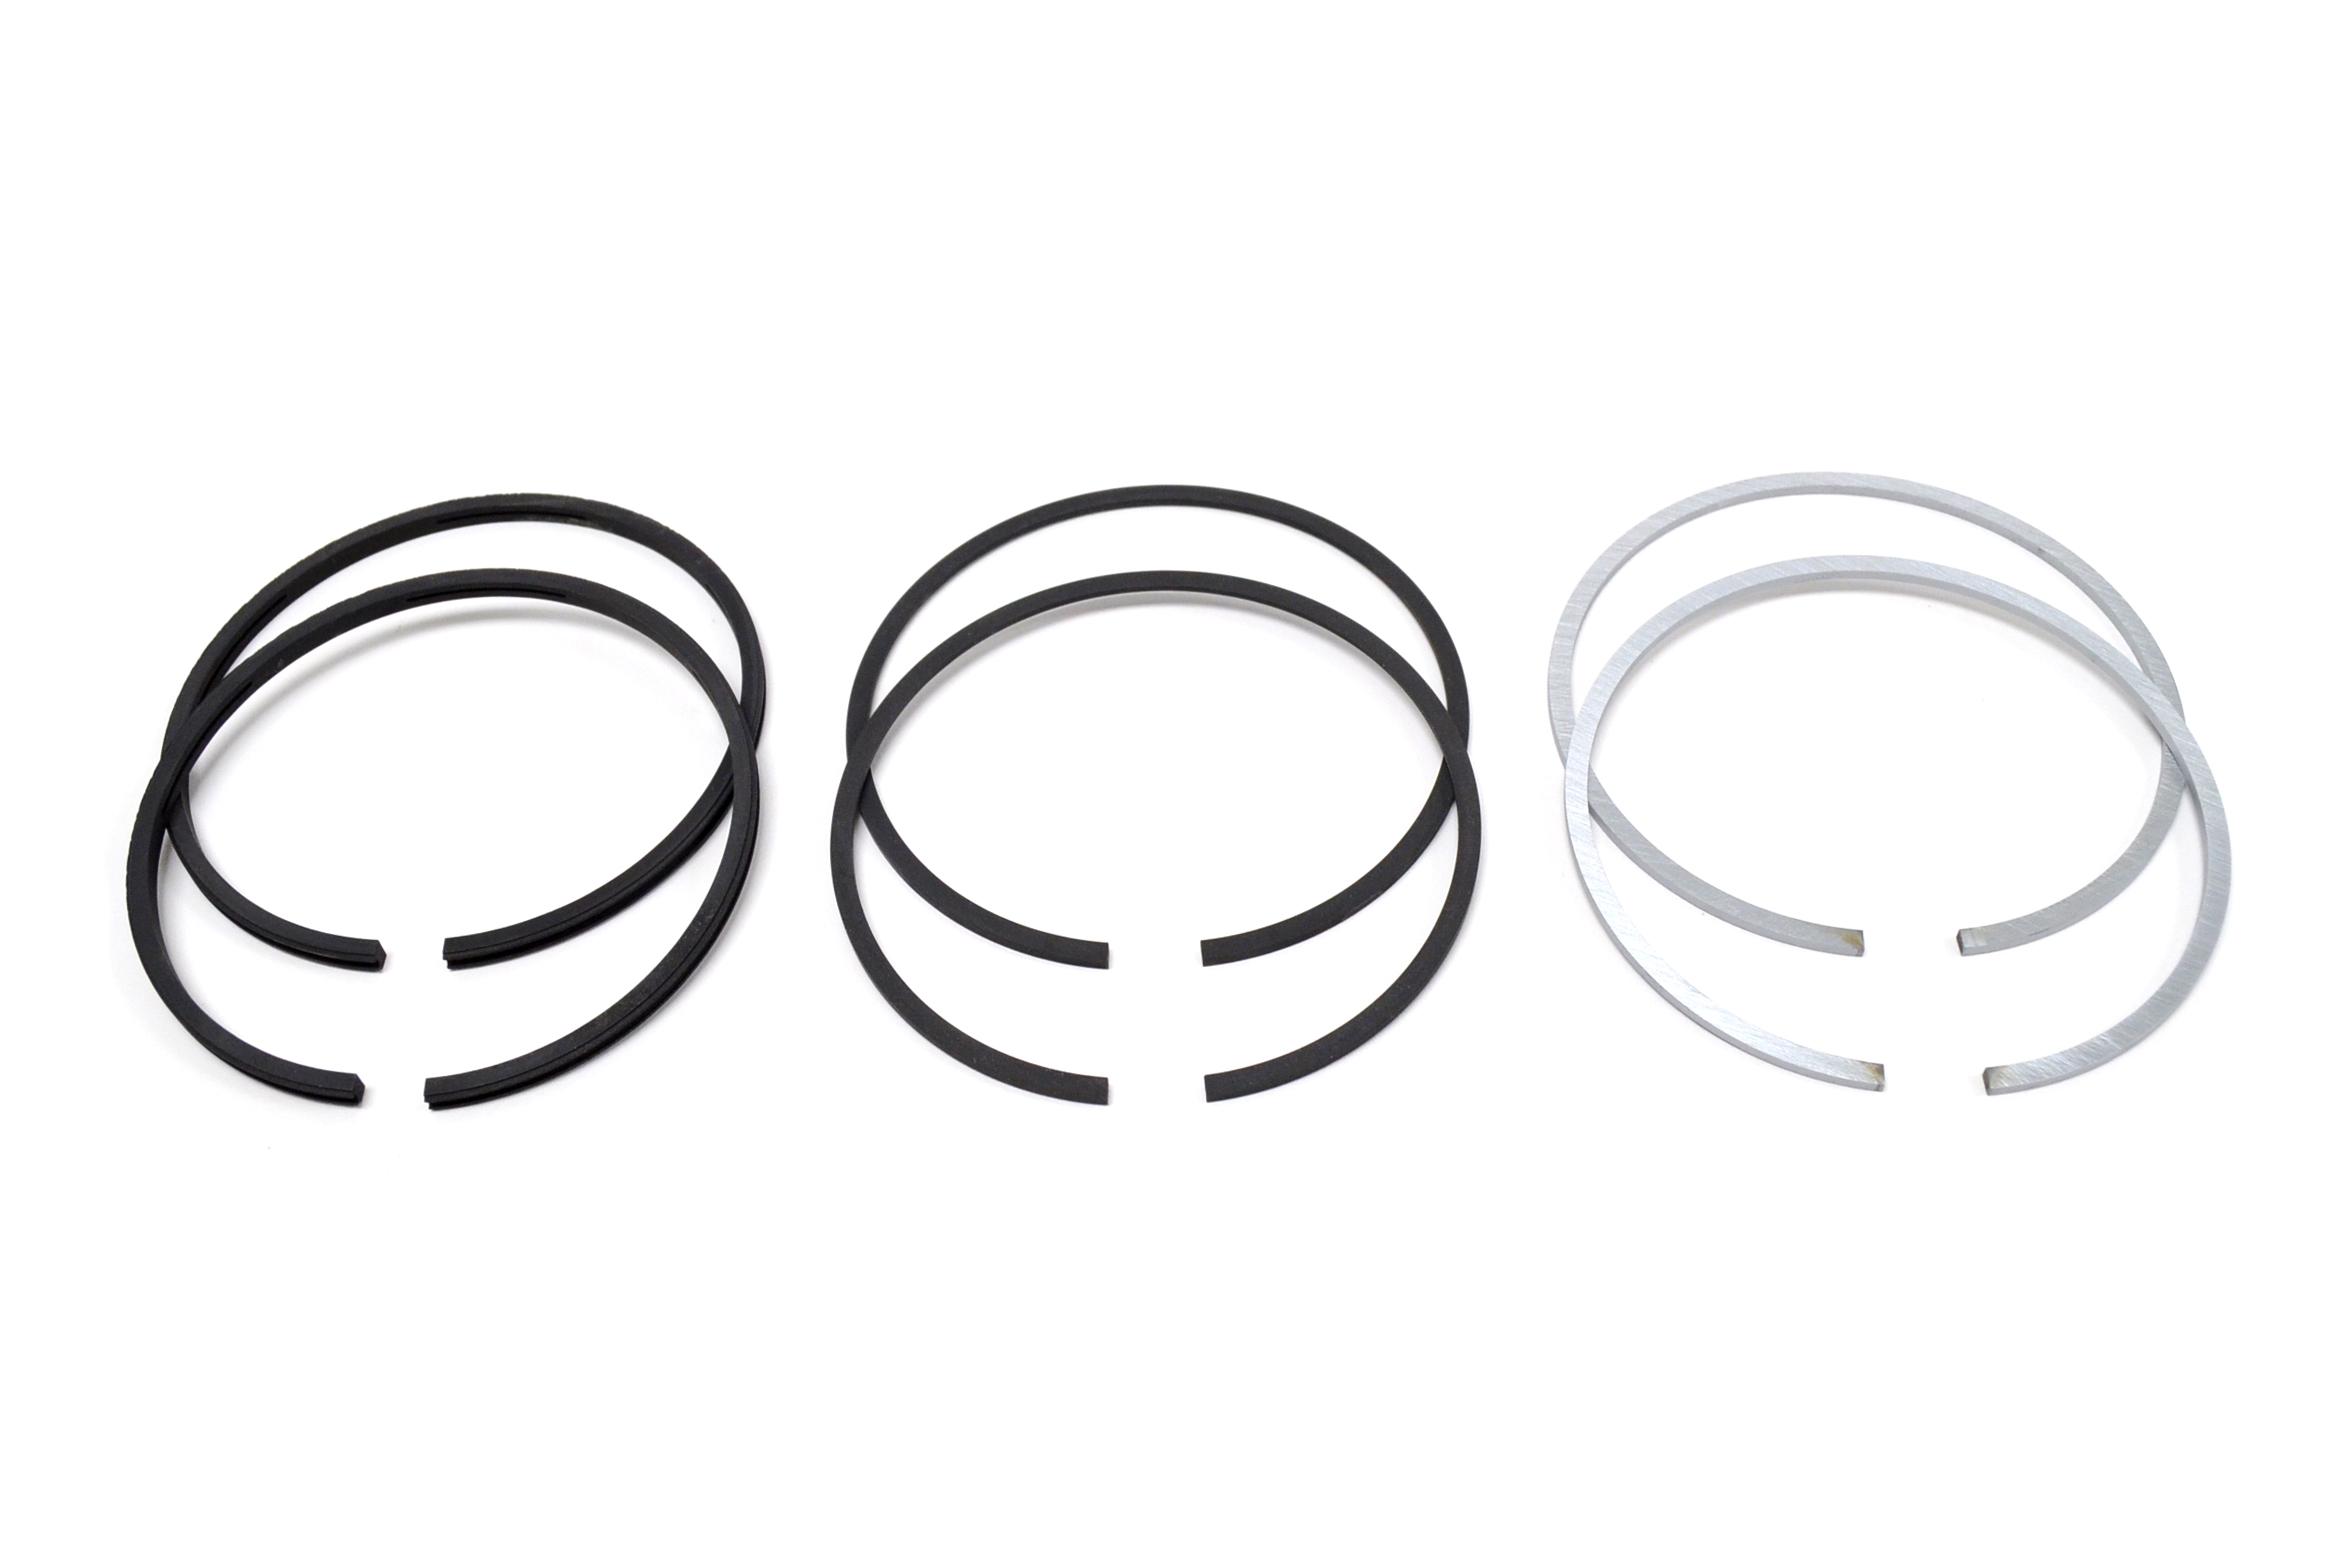 bsa a65 all years piston ring set hastings standard r17350  hstd